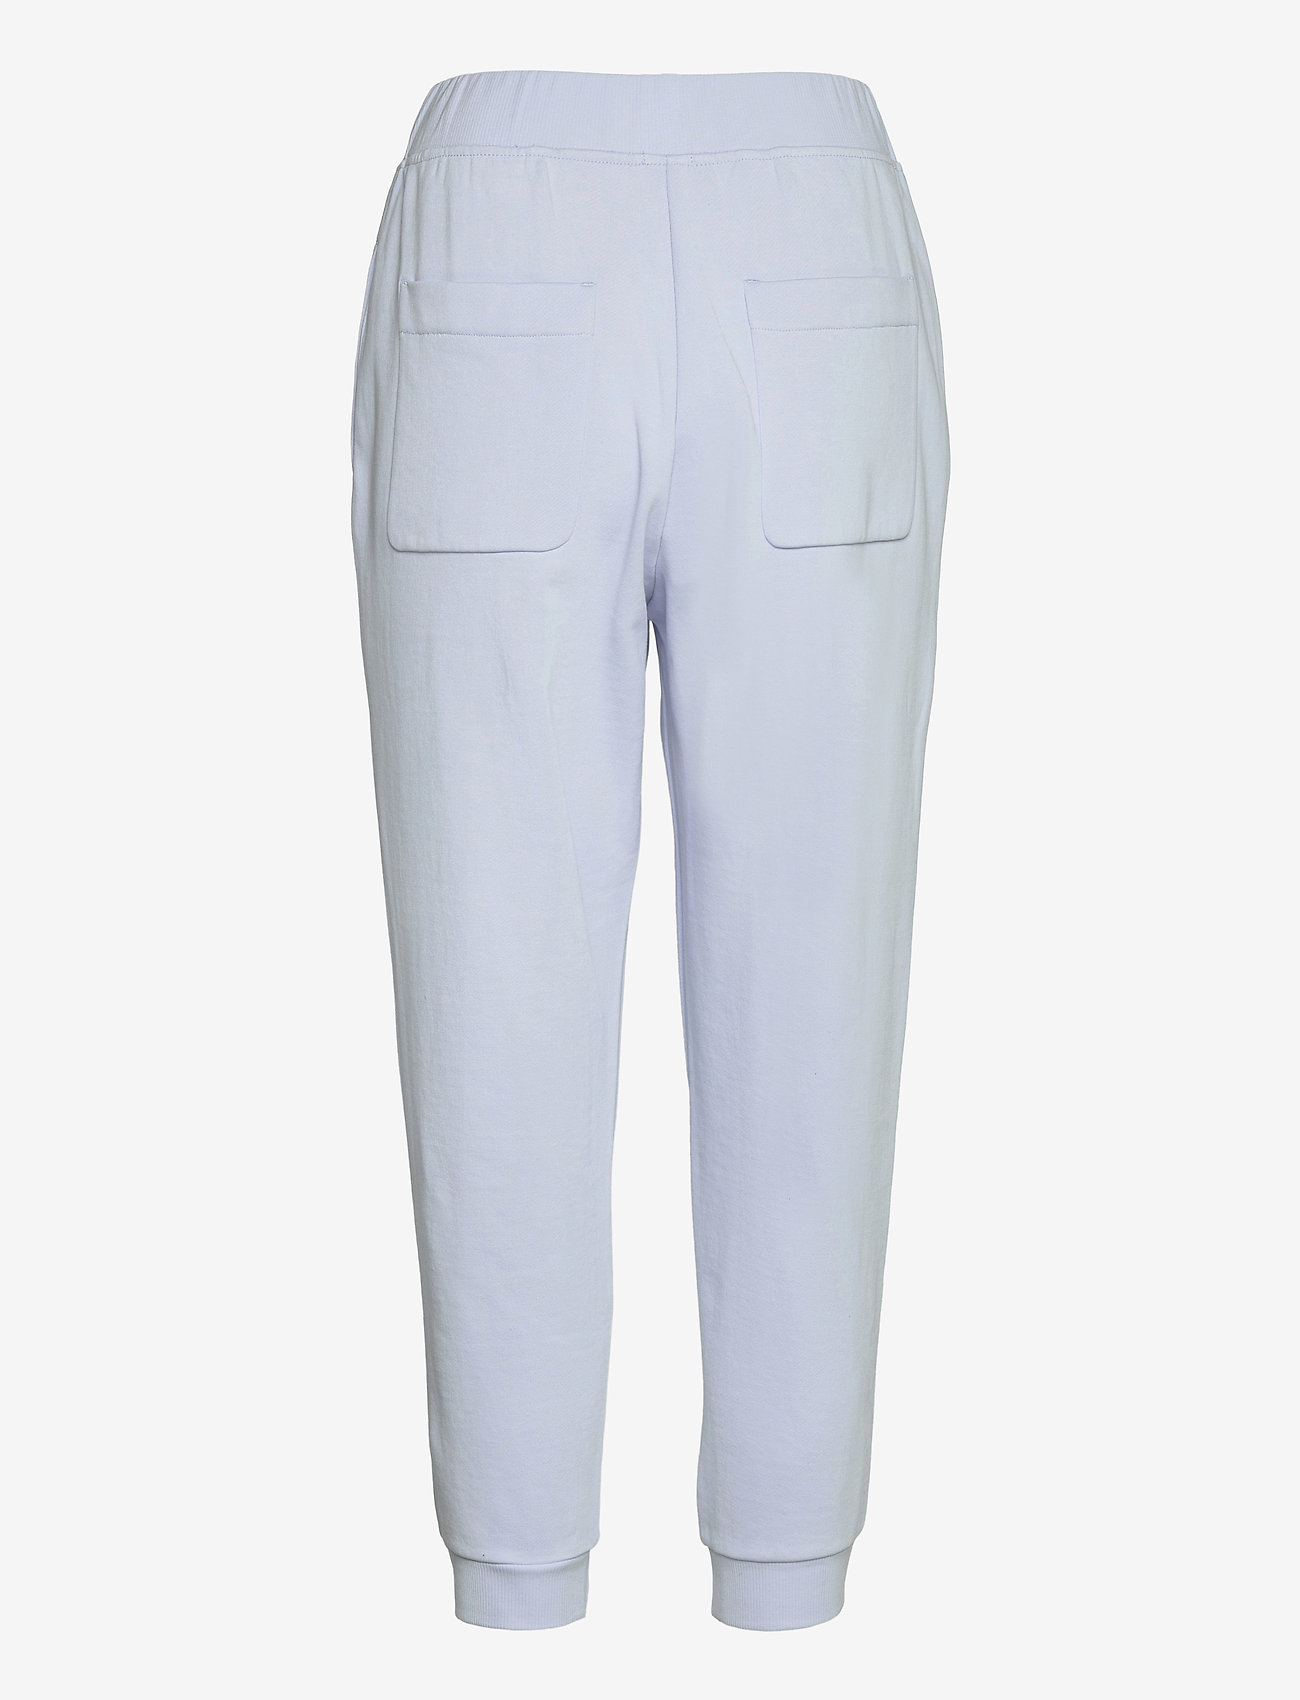 Max Mara Leisure - BRIC - casual trousers - light blue - 1